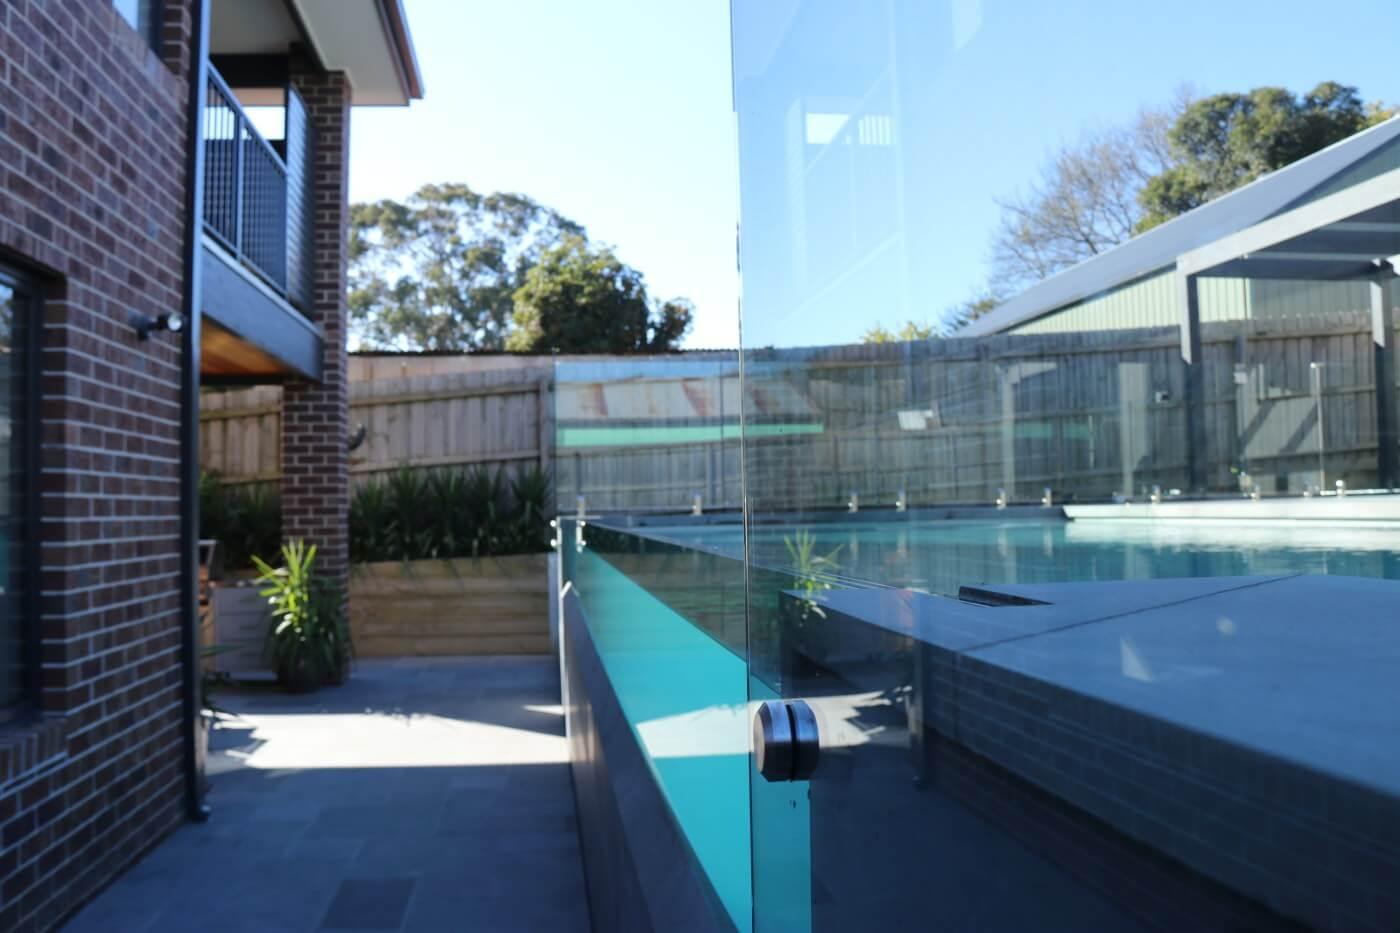 Compass Pools Melbourne Sanctuary 9.4m pool with Maxi Rib in Quartz colour 05